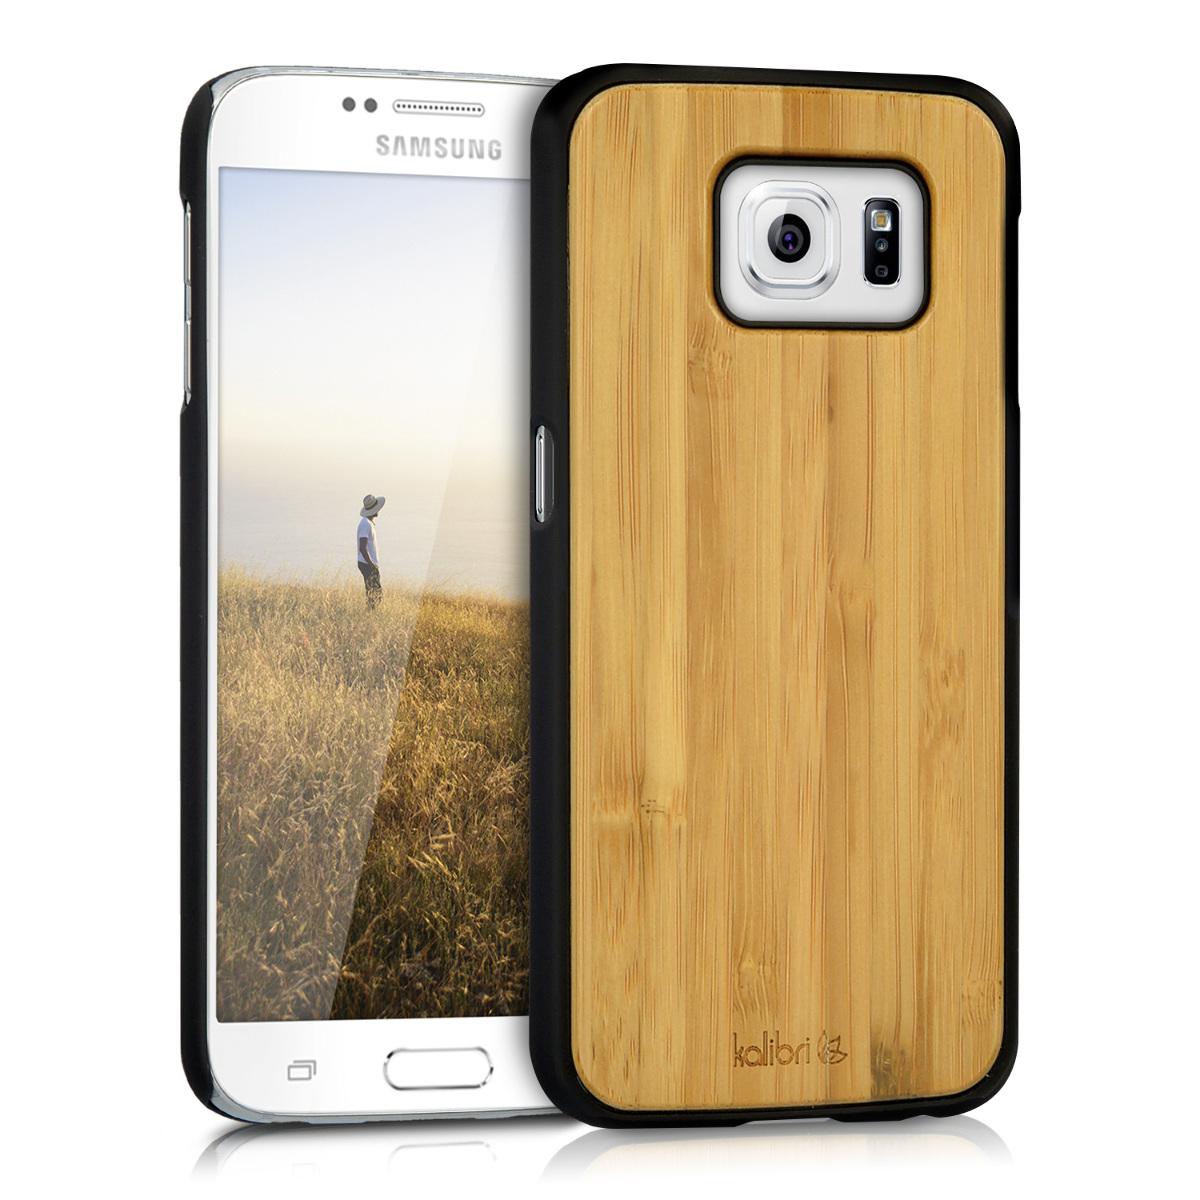 Kalibri Σκληρή Ξύλινη Θήκη Samsung Galaxy S6 / S6 Duos - Premium real wood -  light brown - (39055.11)